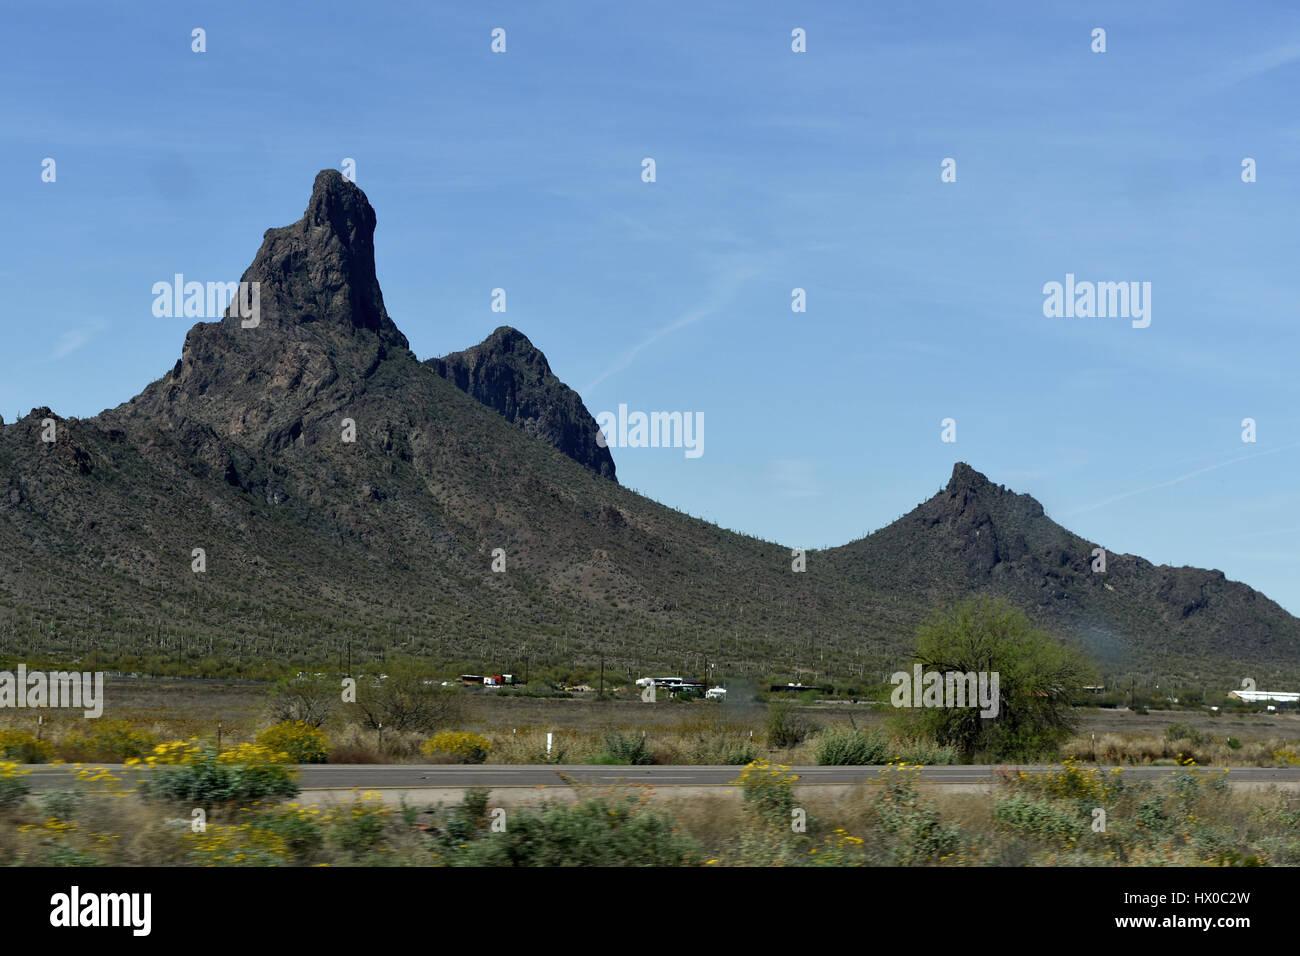 Picacho Peak national park, AZ - Stock Image